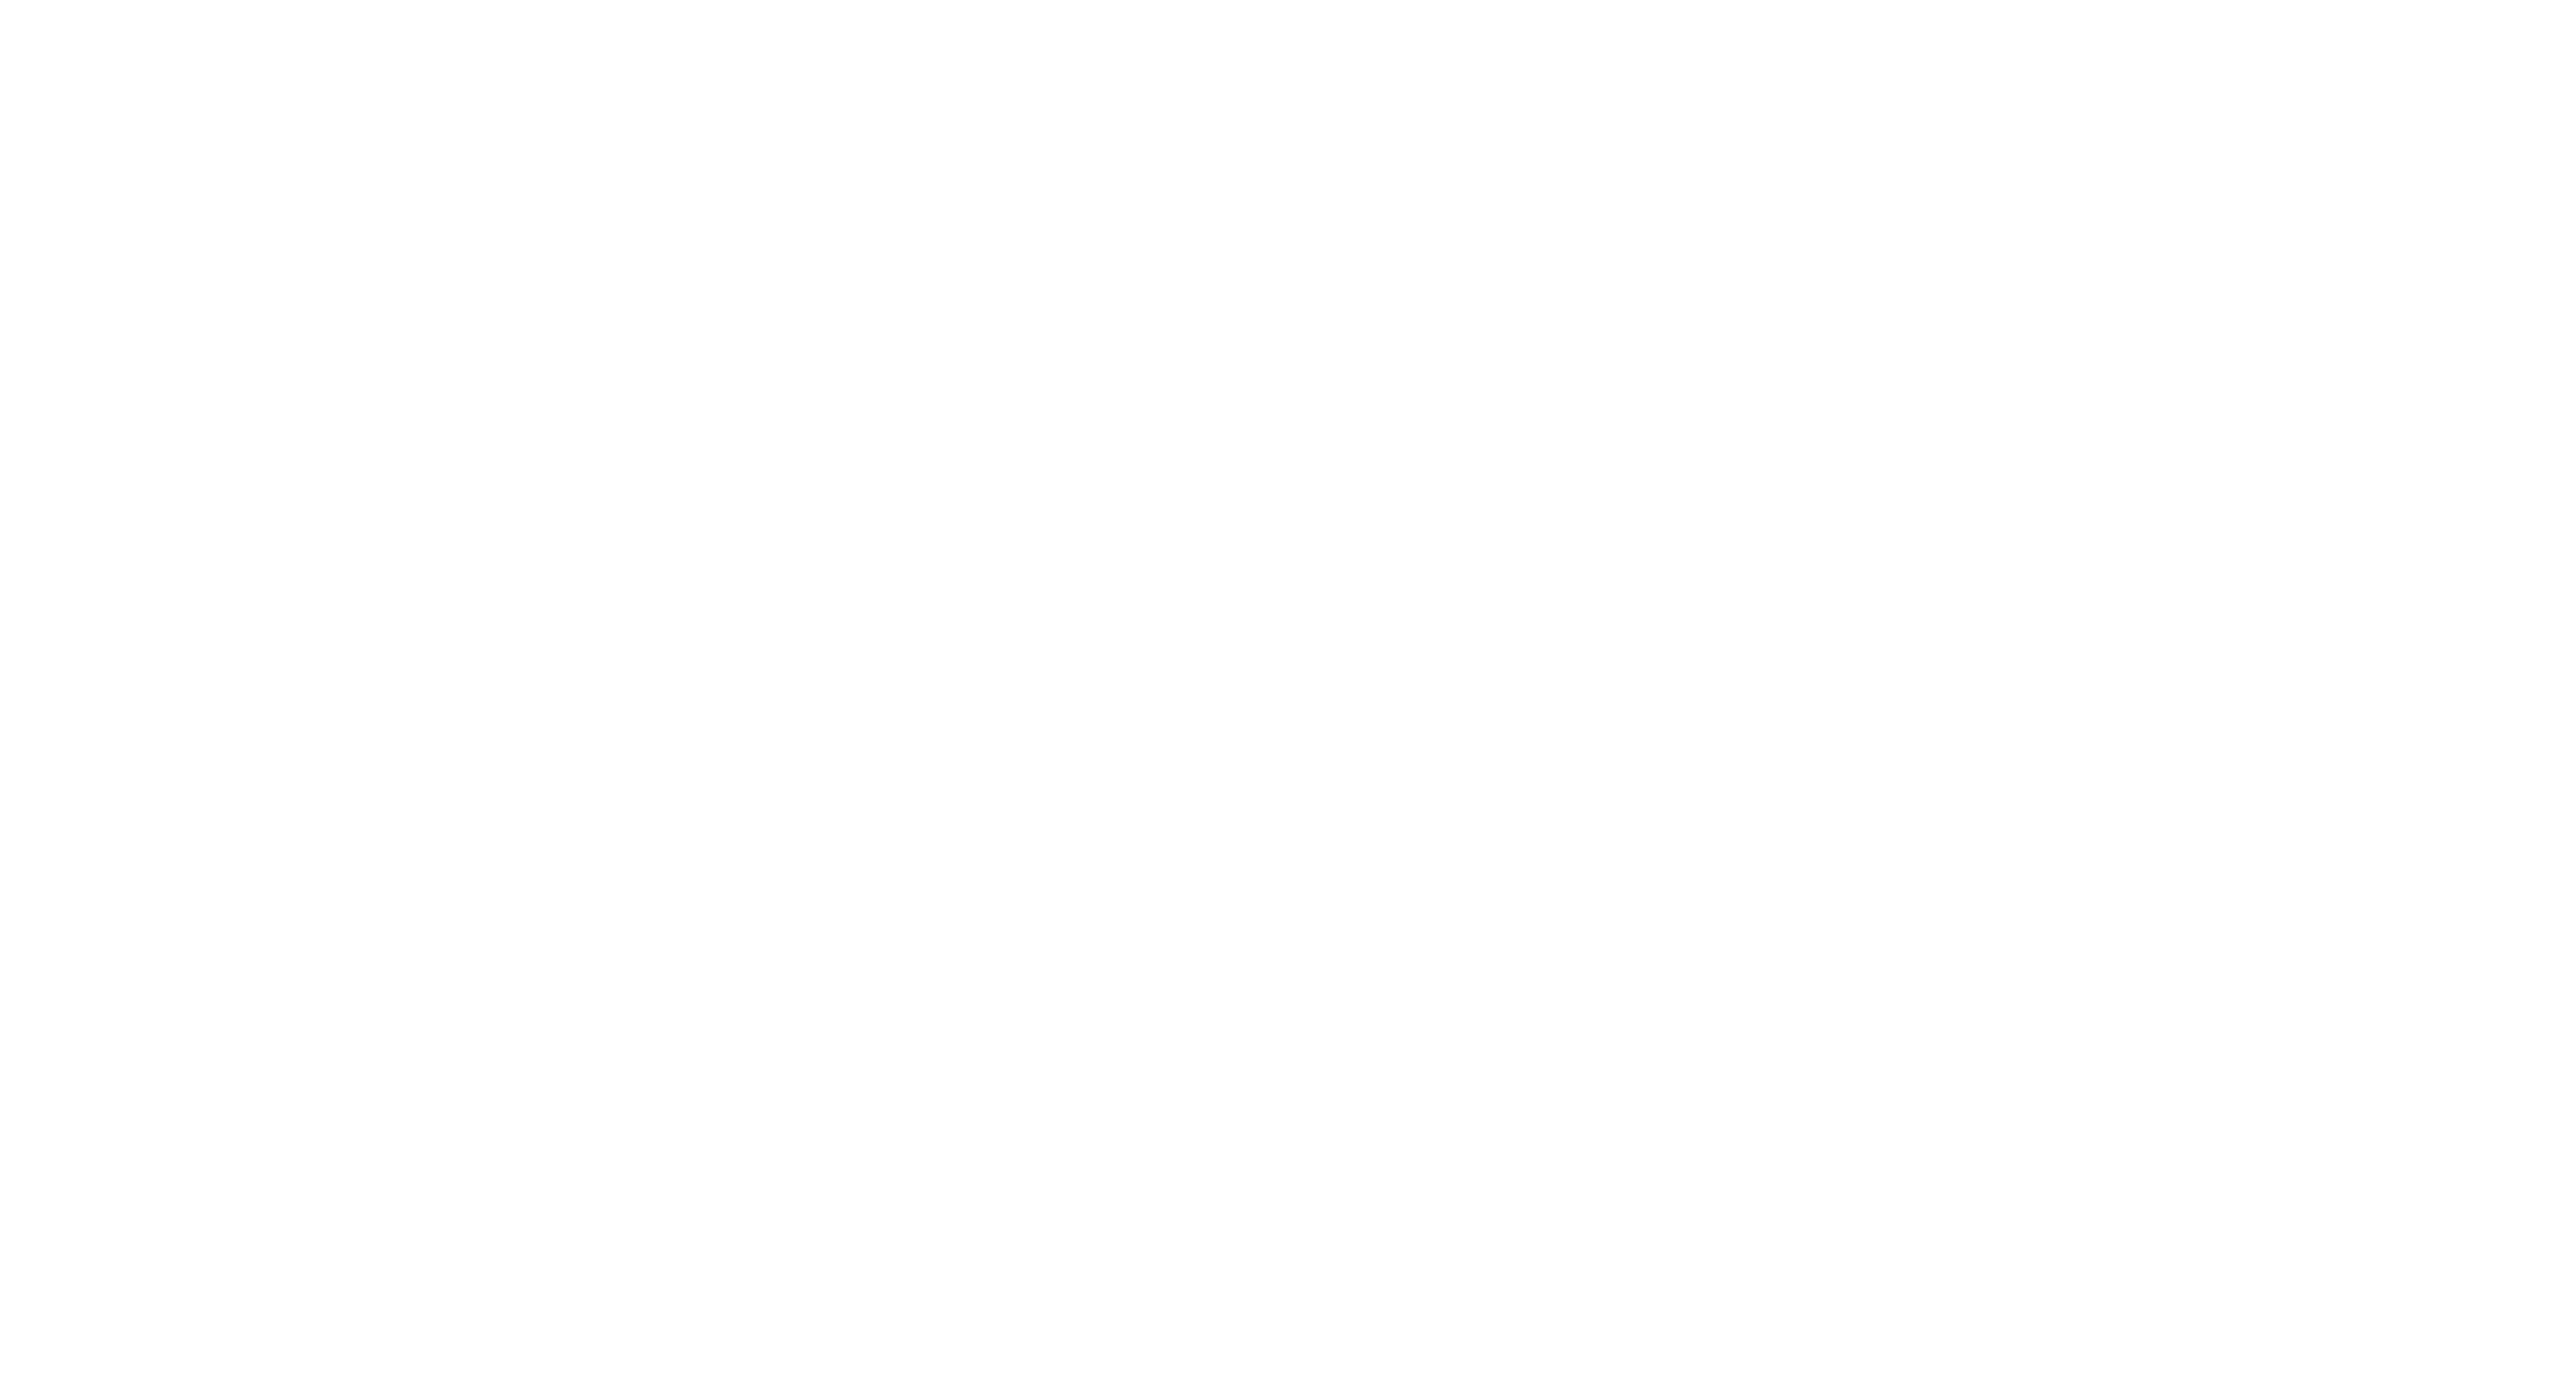 SpotifyHTML 5App